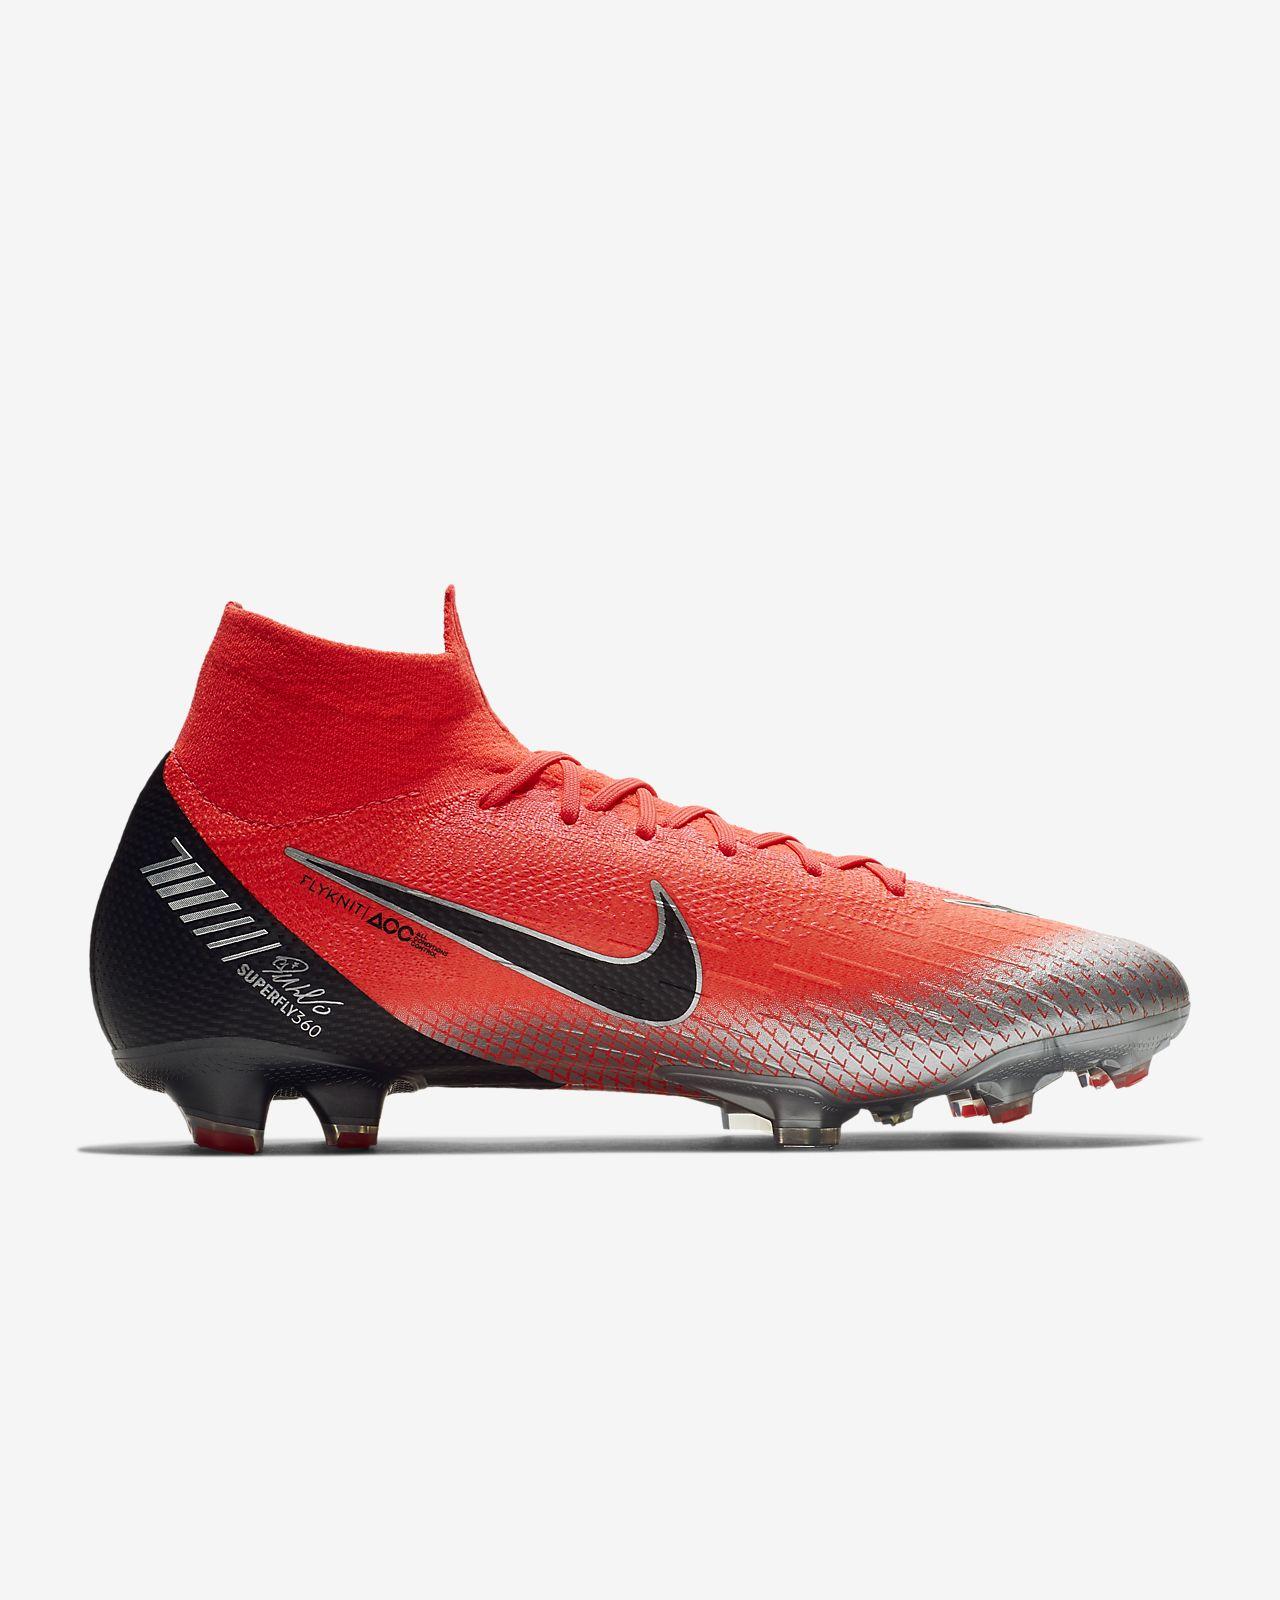 timeless design fdc51 19b73 ... Korki piłkarskie na twardą murawę Nike Mercurial Superfly 360 Elite LVL  UP SE FG